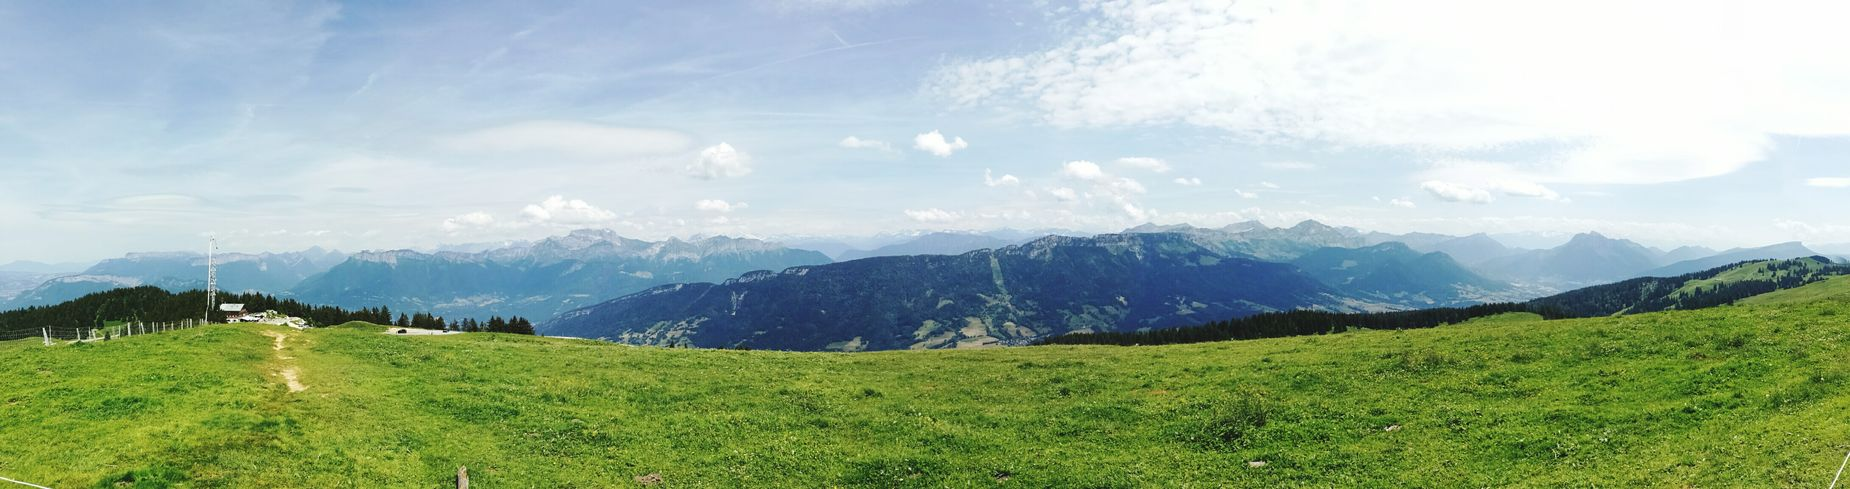 Semnoz Mountains